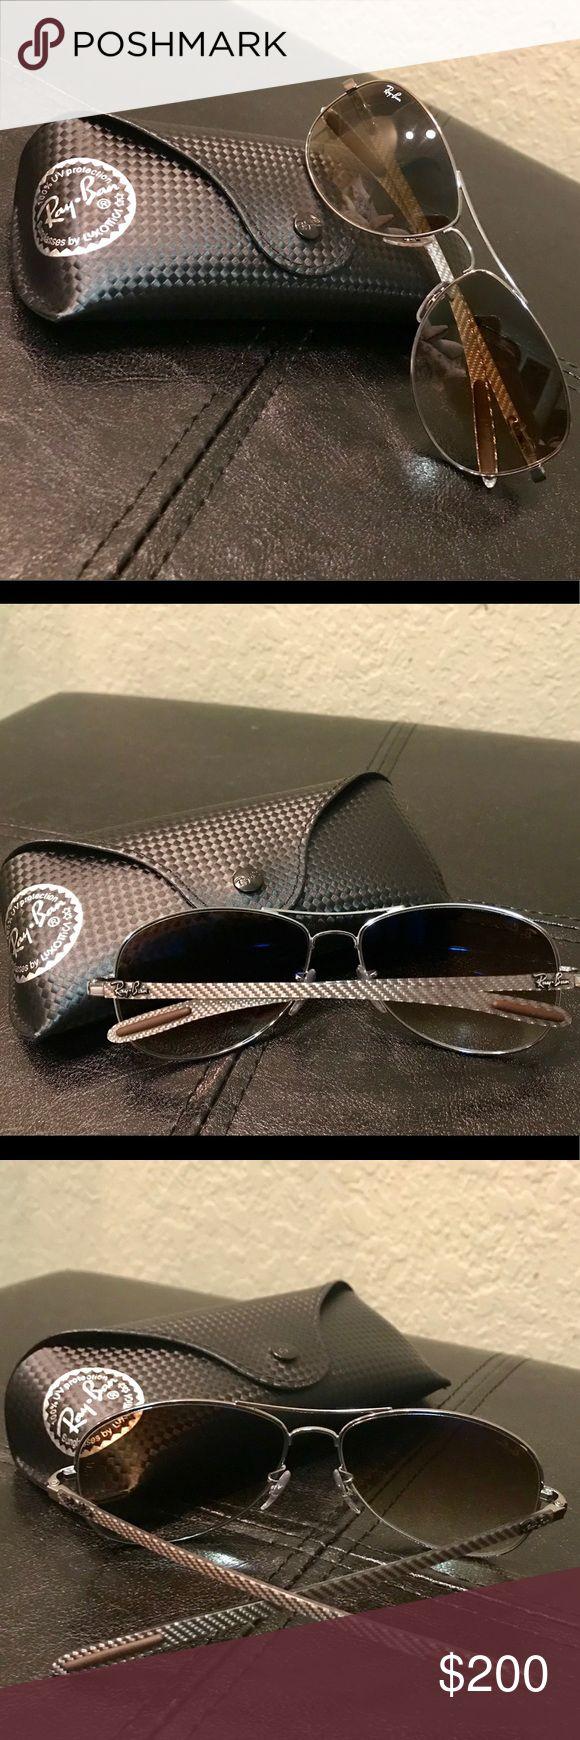 Ray Ban Carbon Fibre Gunmetal Sunglasses Ray Ban Carbon Fibre gunmetal Sunglasses Ray-Ban Accessories Sunglasses